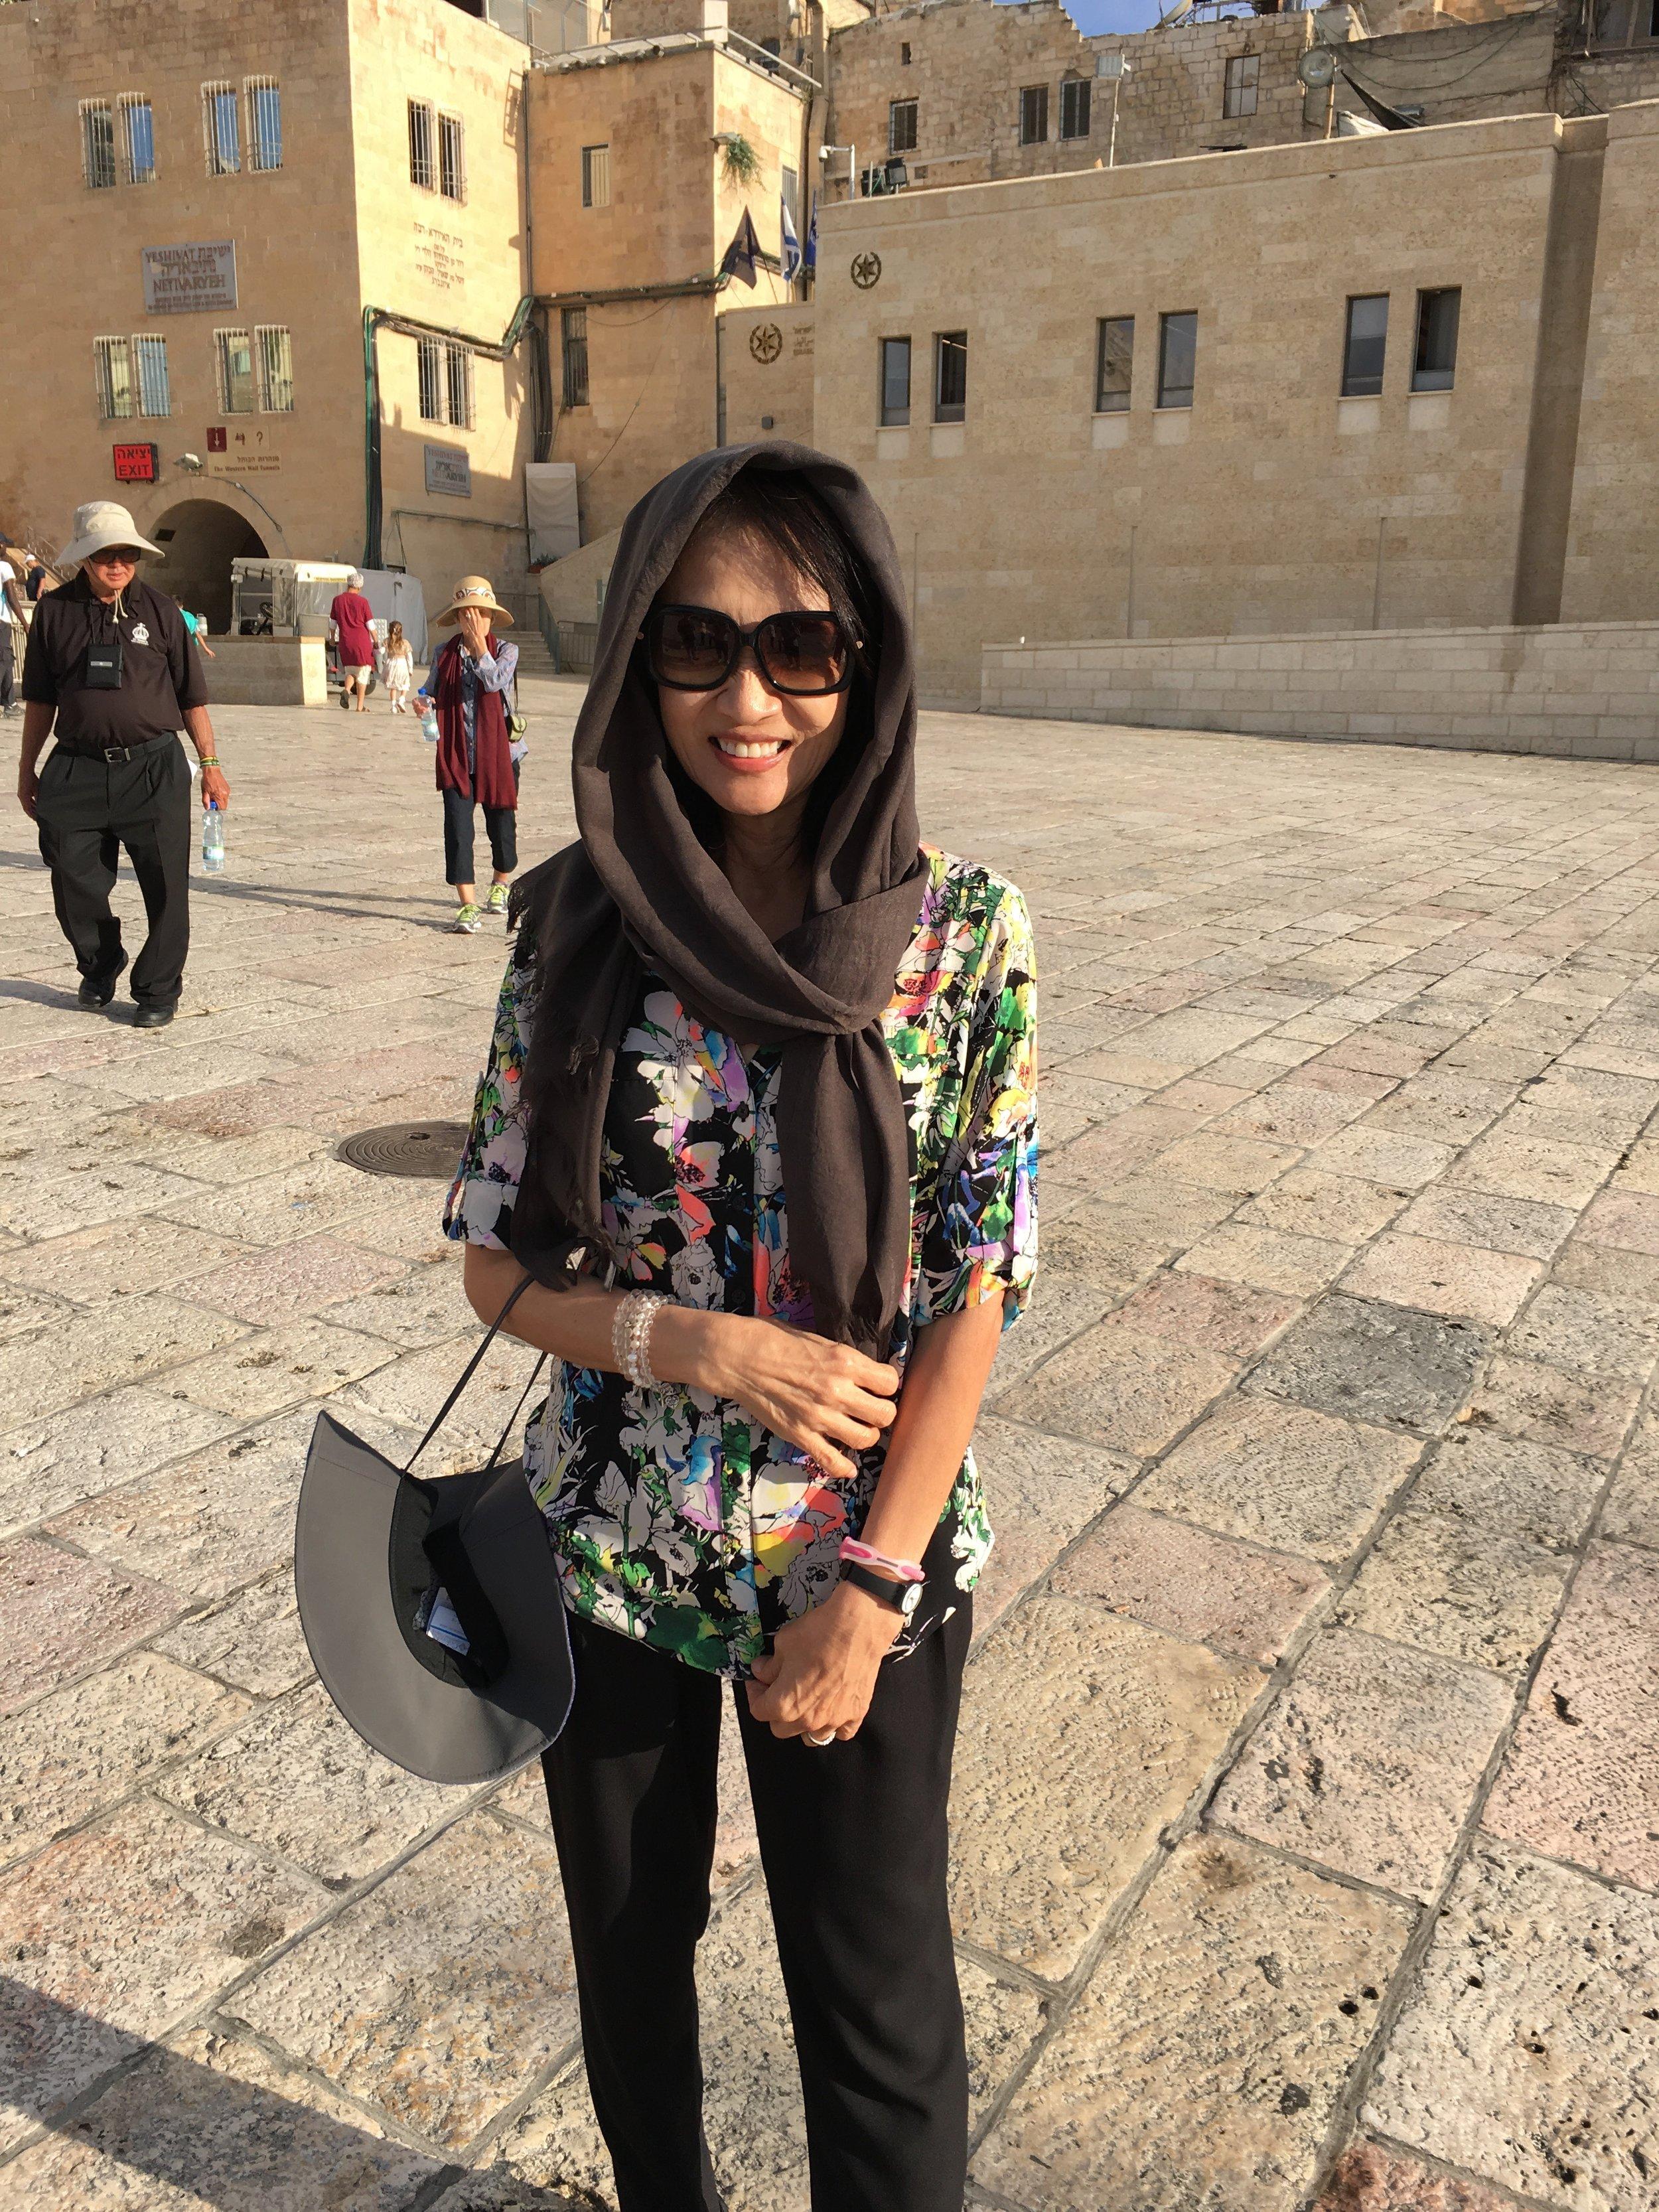 Karen at the Western Wall in Jerusalem